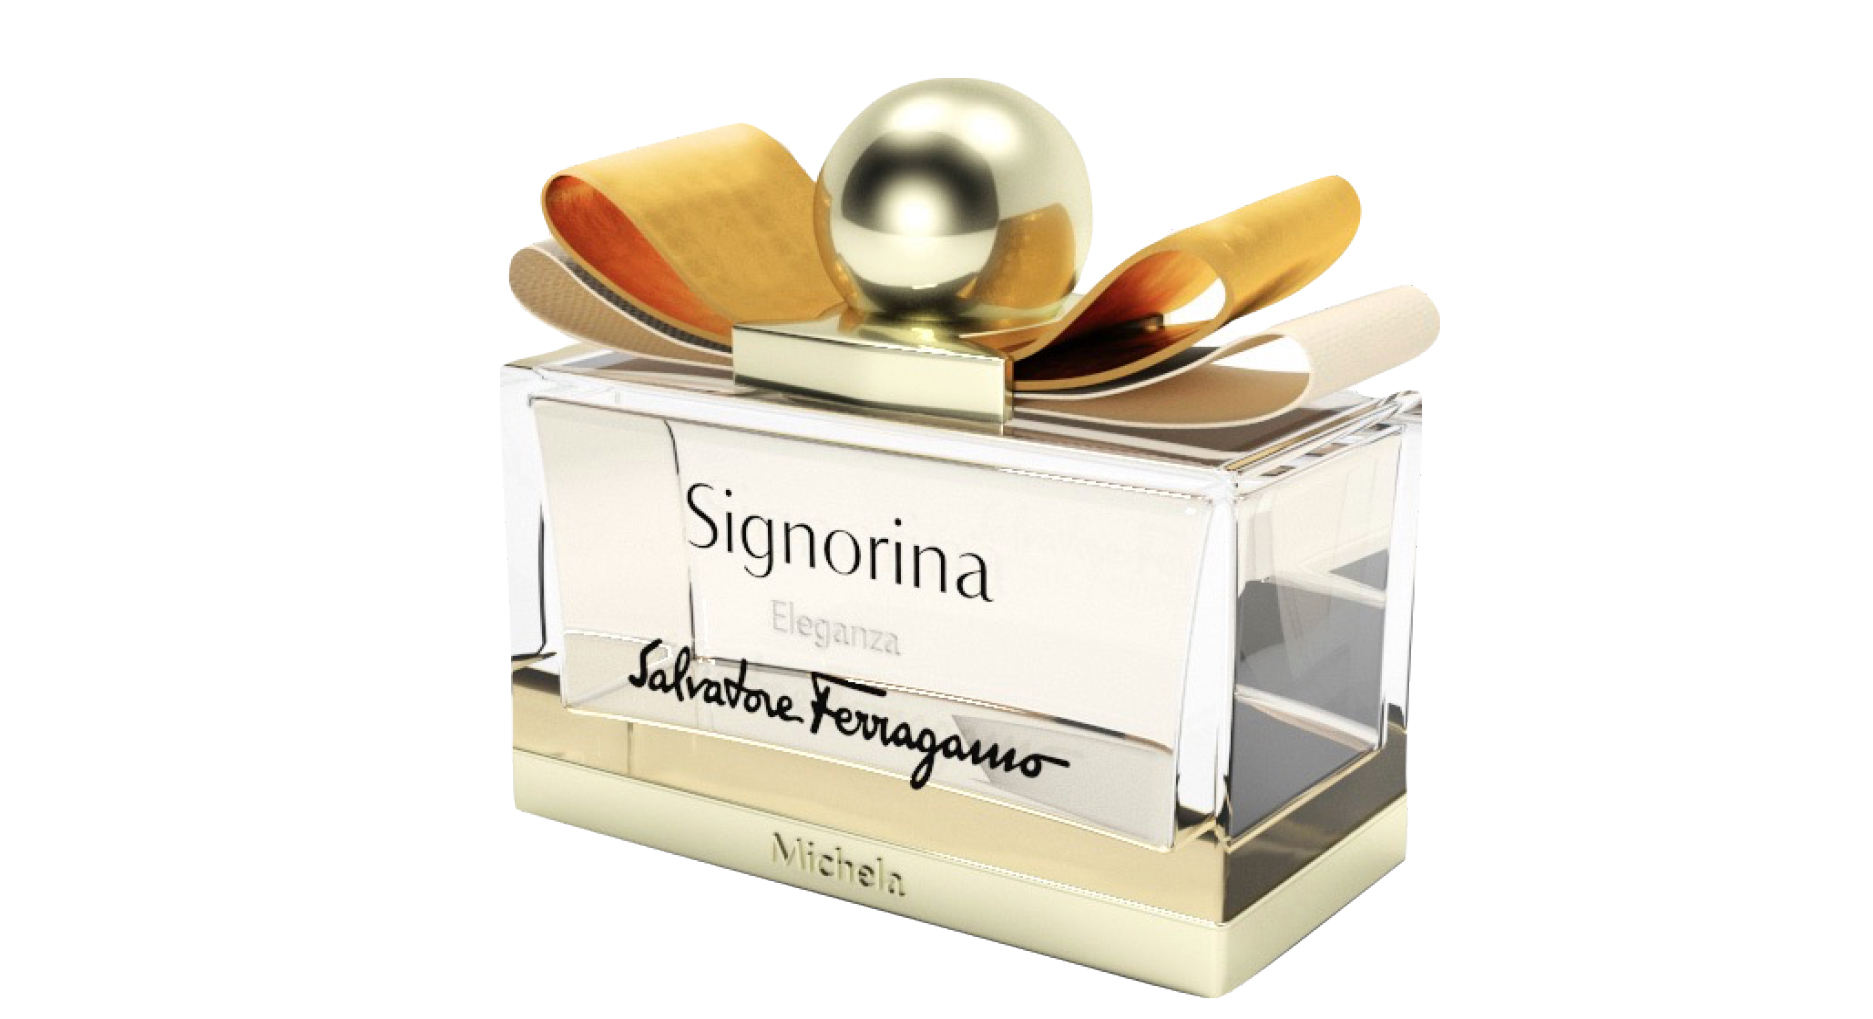 Special Packaging Signorina